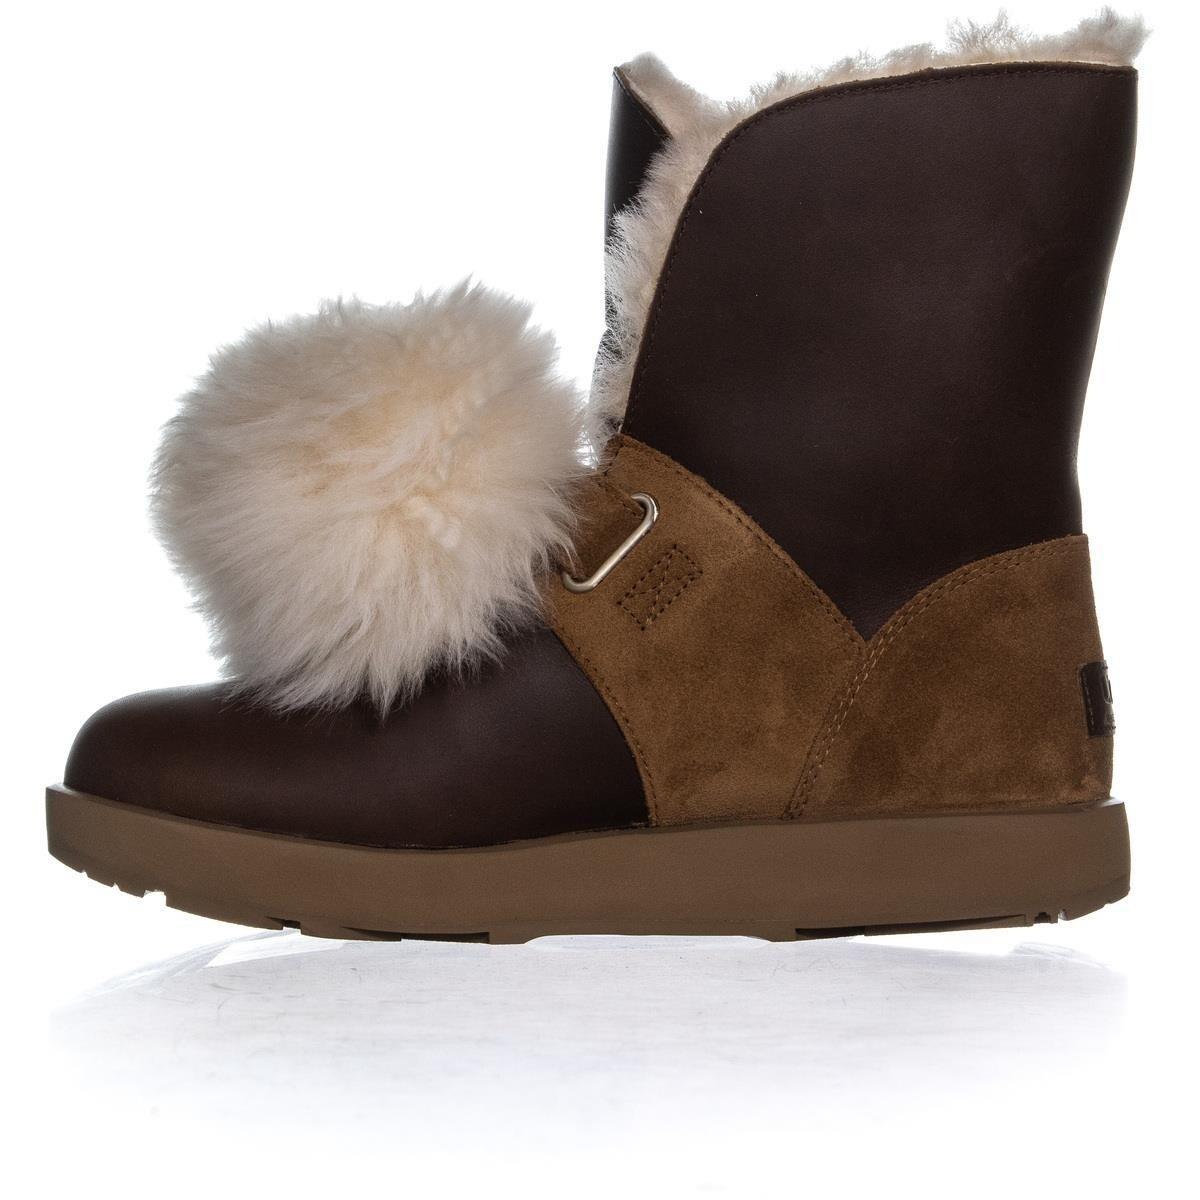 77c7f943315 UGG Isley Waterproof Winter Boots, Chestnut - 8.5 us / 39.5 eu